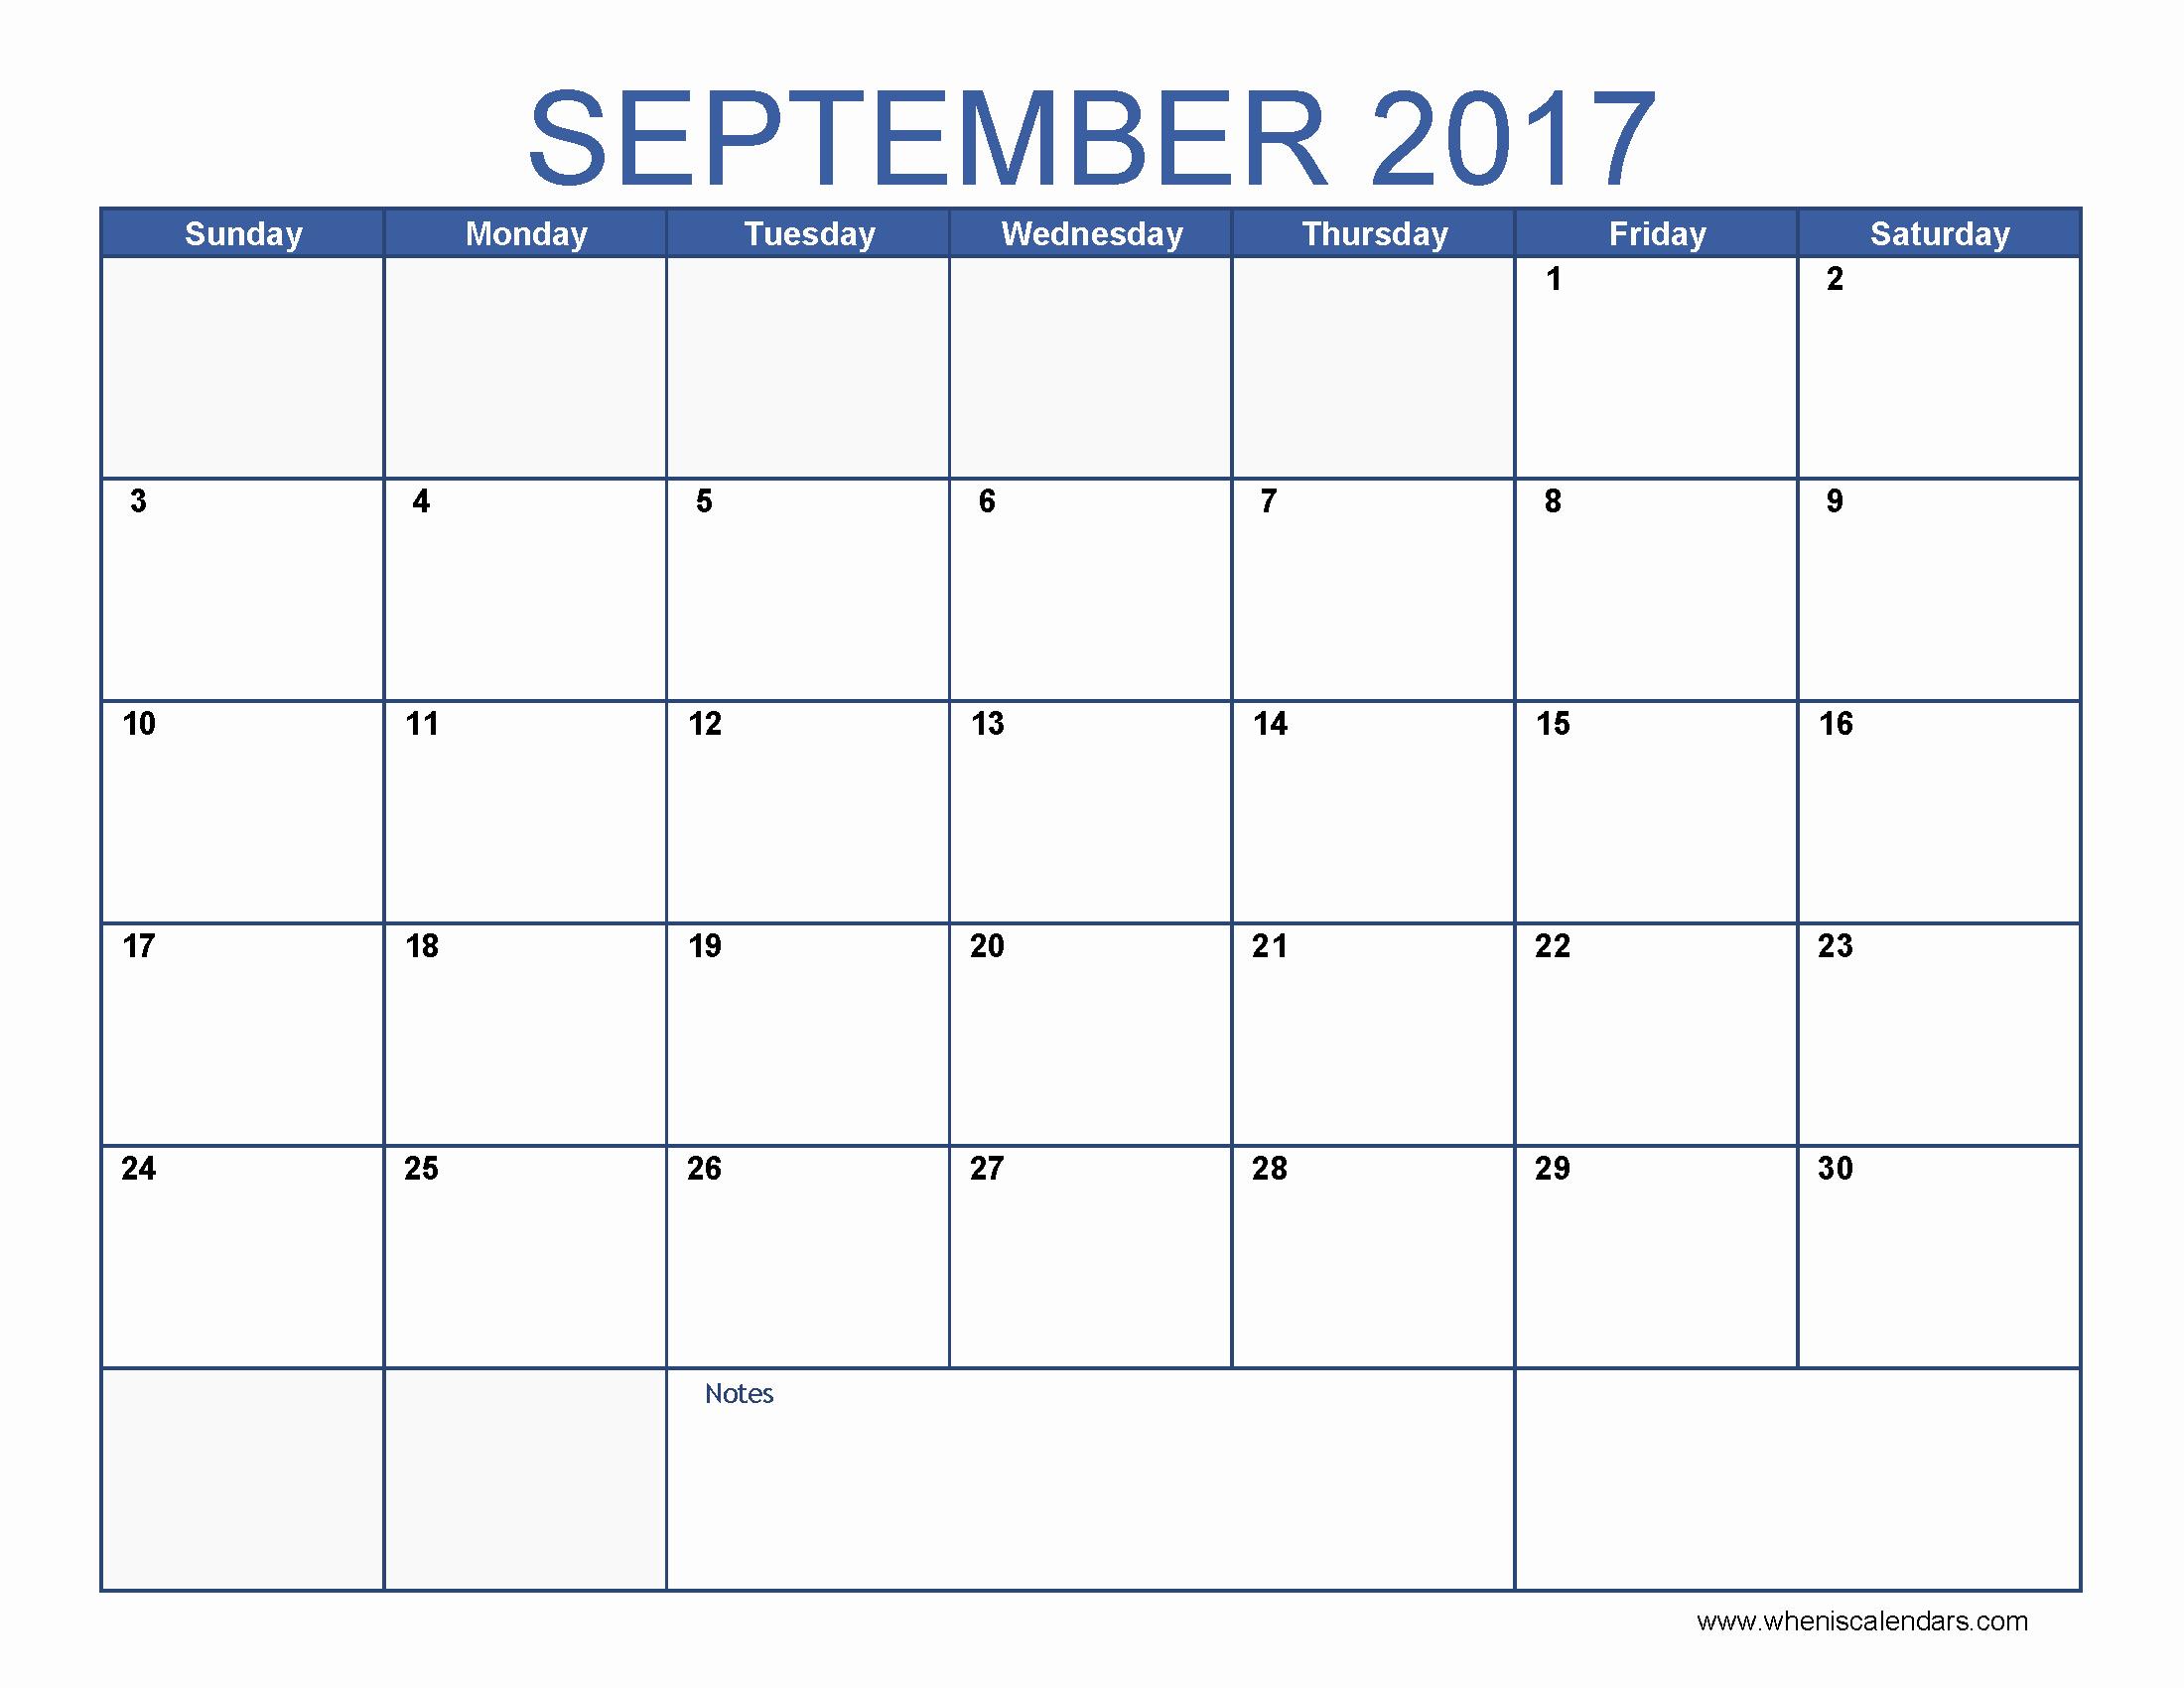 2017 Monthly Calendar Free Printable Luxury September 2017 Calendar Template